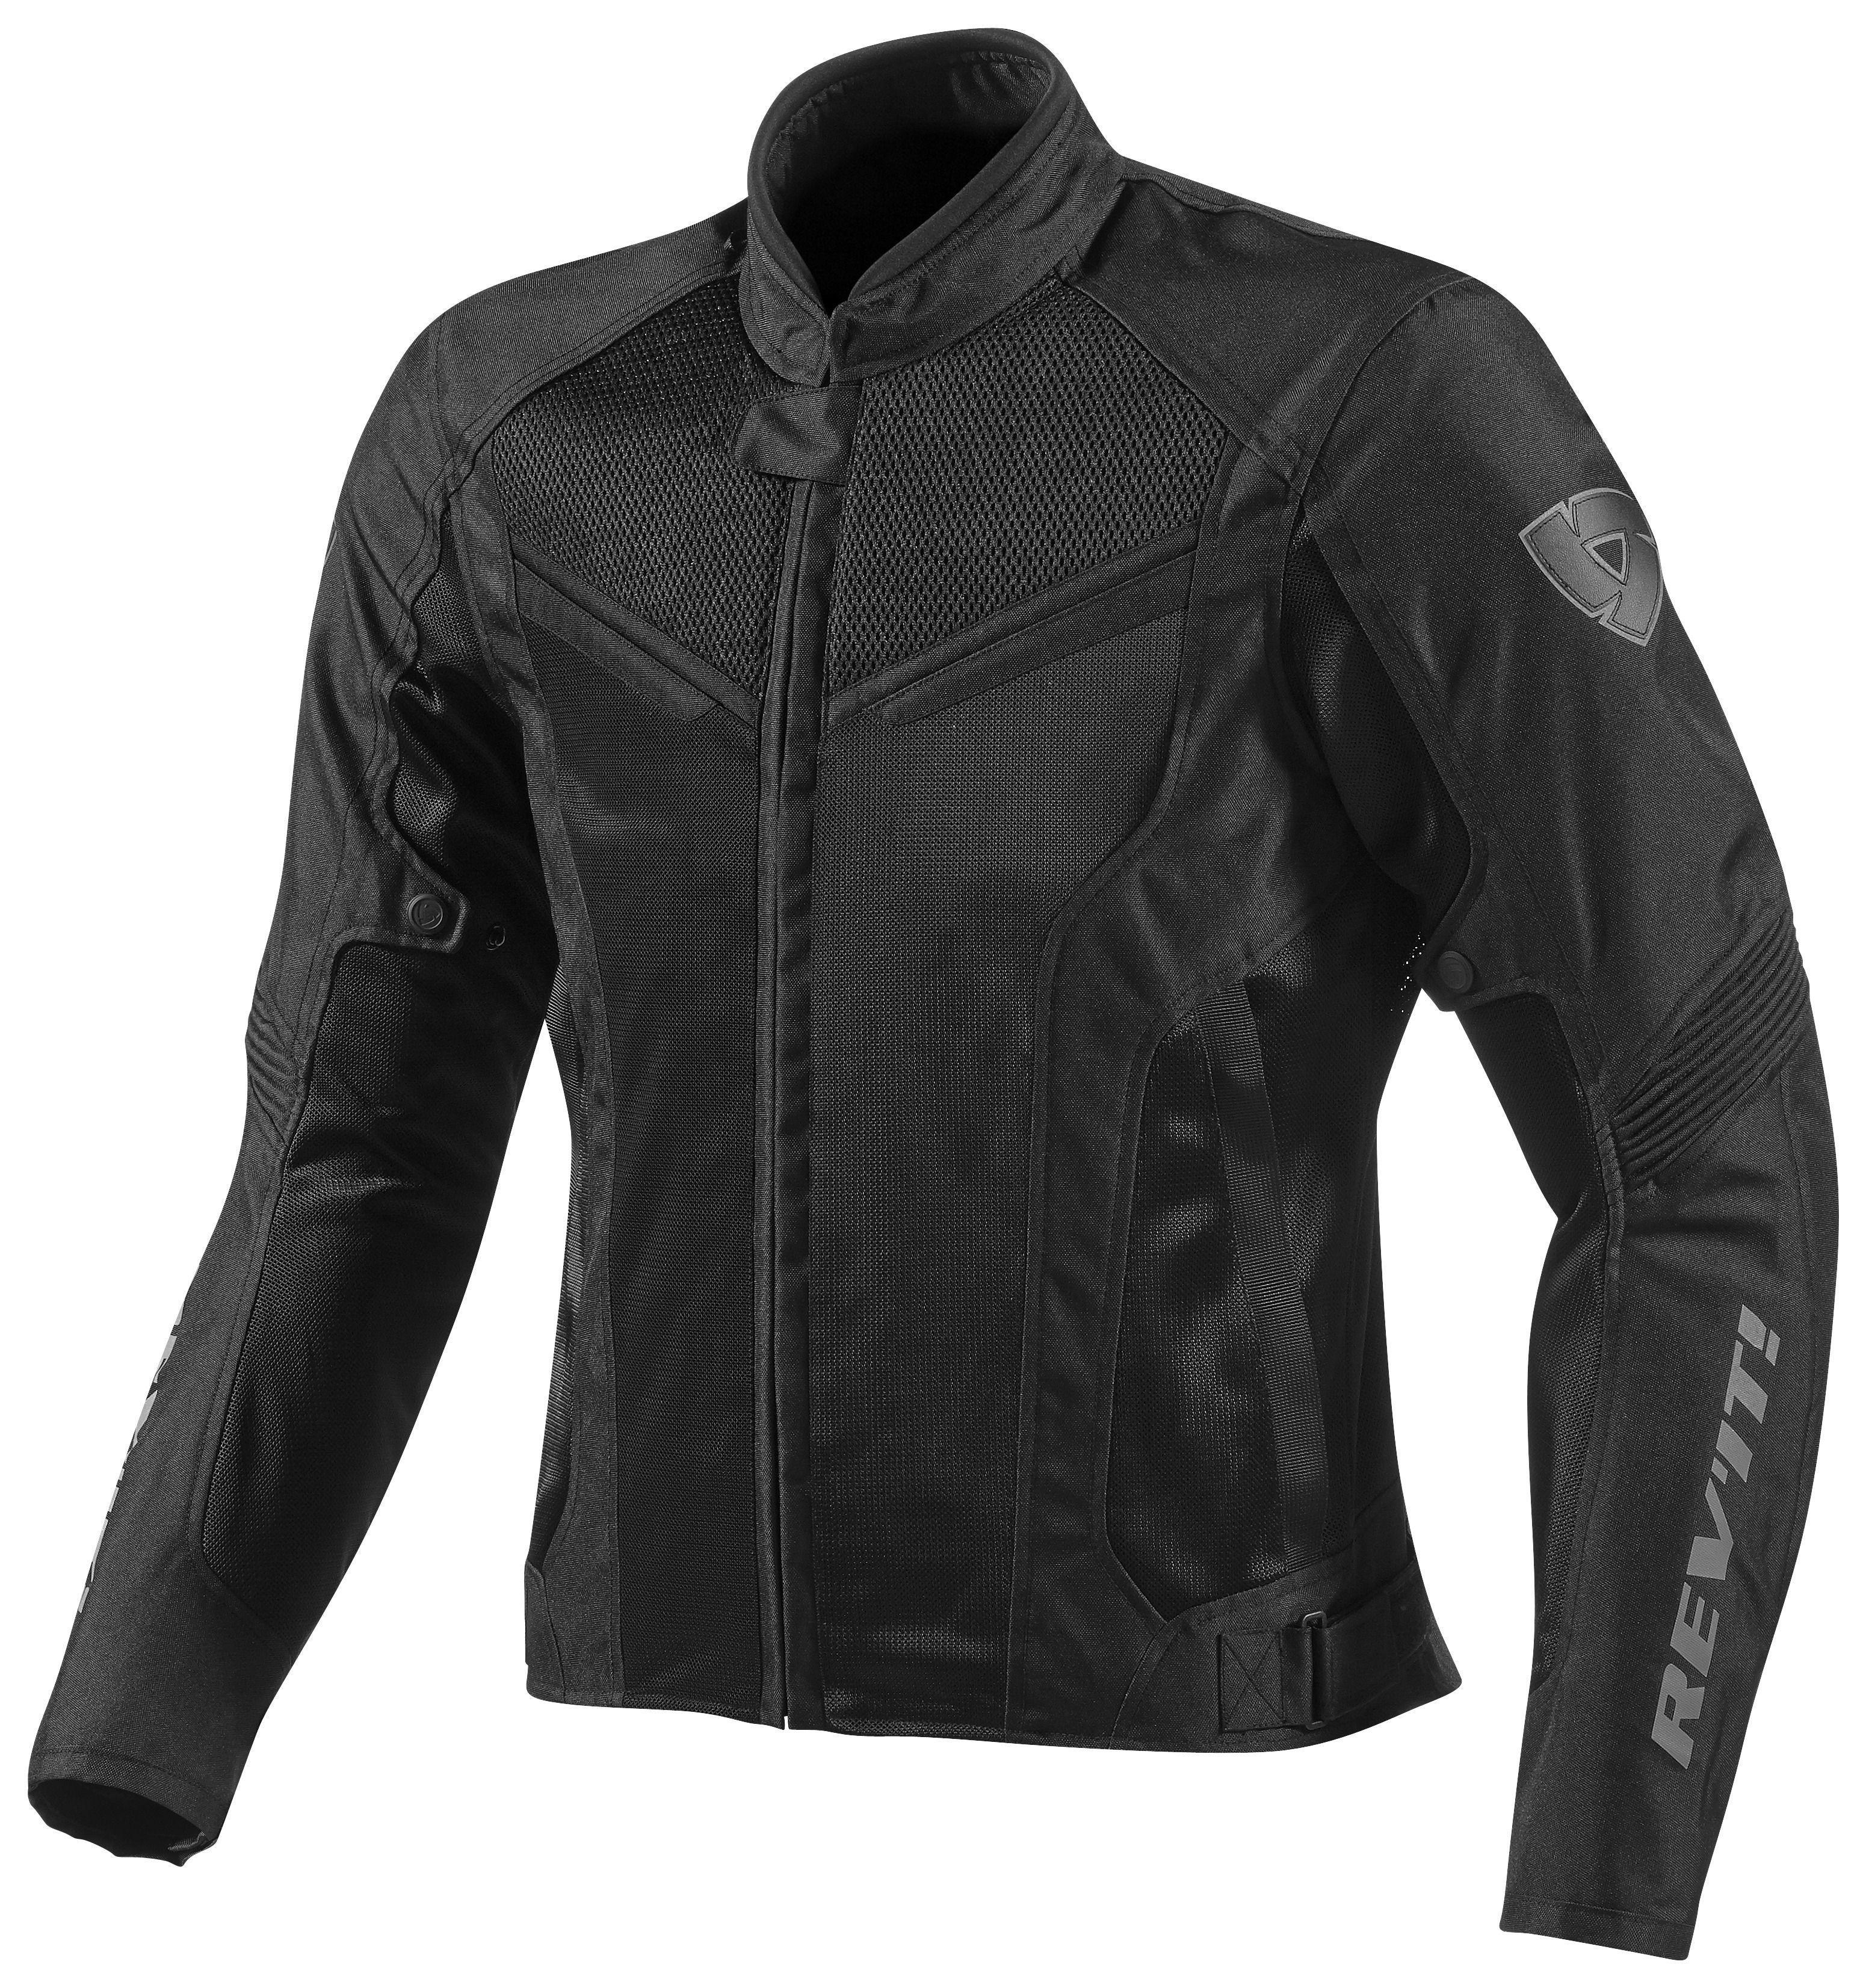 REV'IT! GTR Air 2 Jacket Jackets, Motorcycle jacket